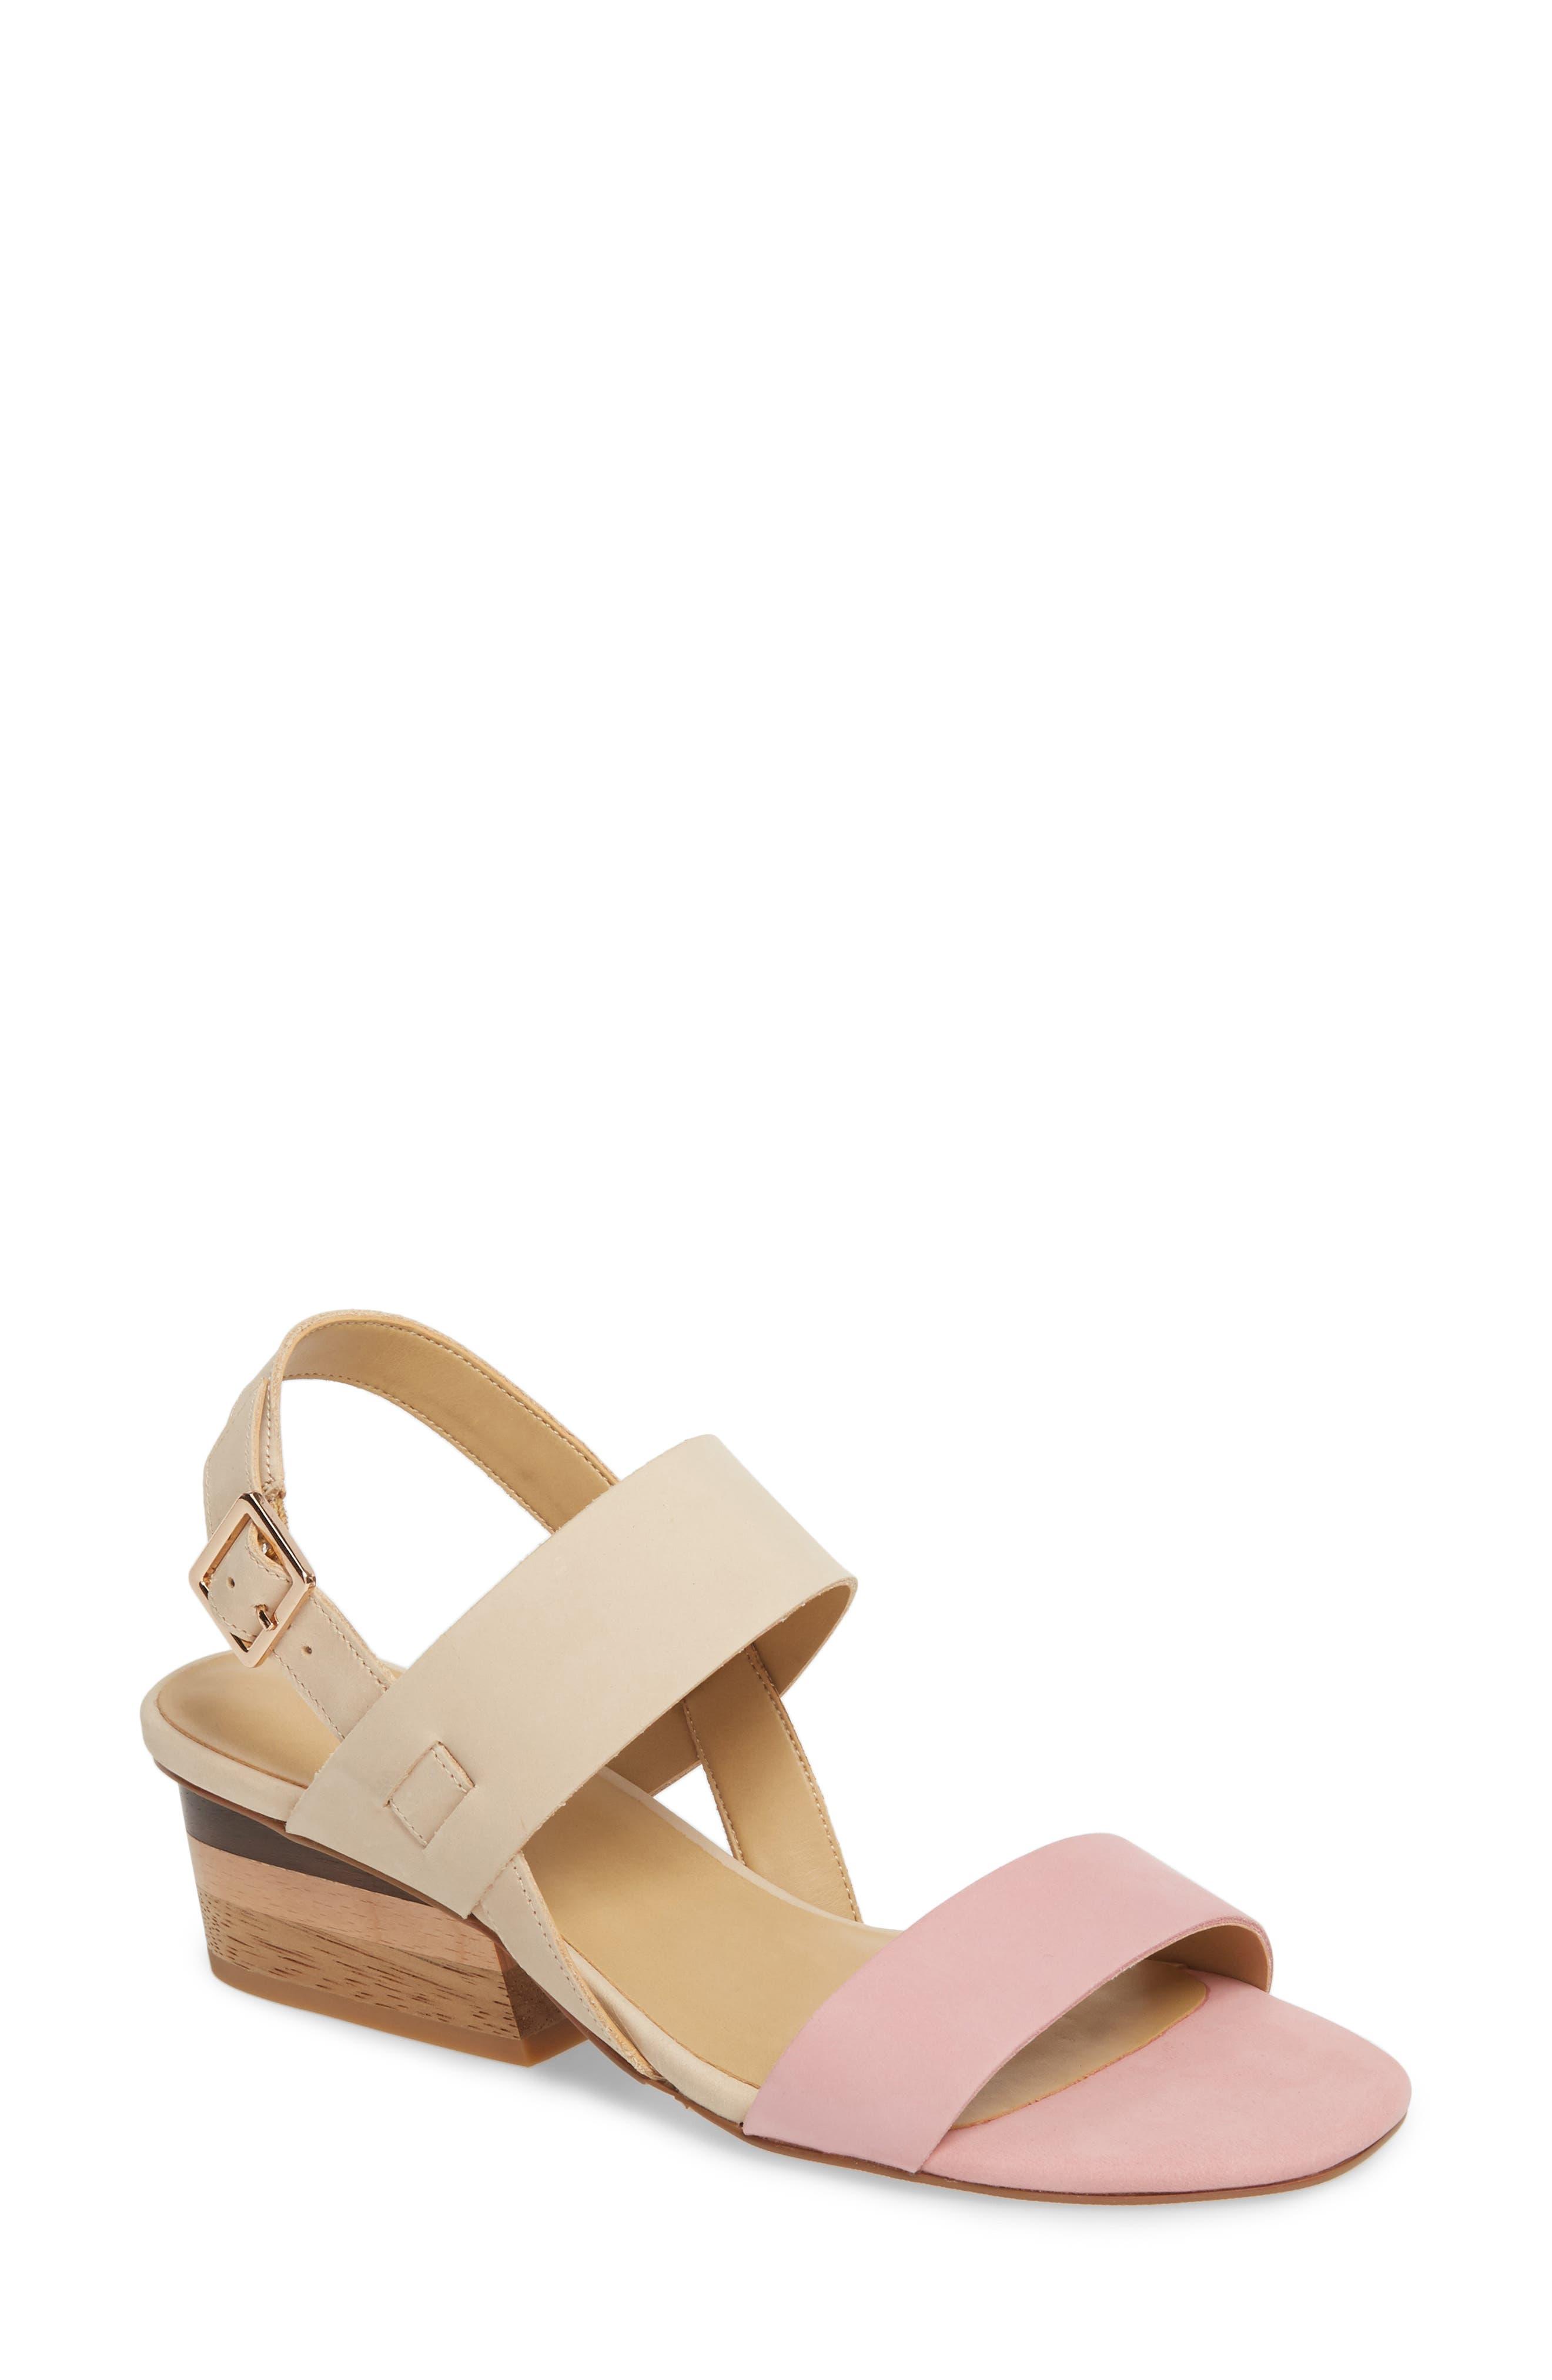 Caryna Slingback Sandal,                         Main,                         color, BEIGE/ PINK